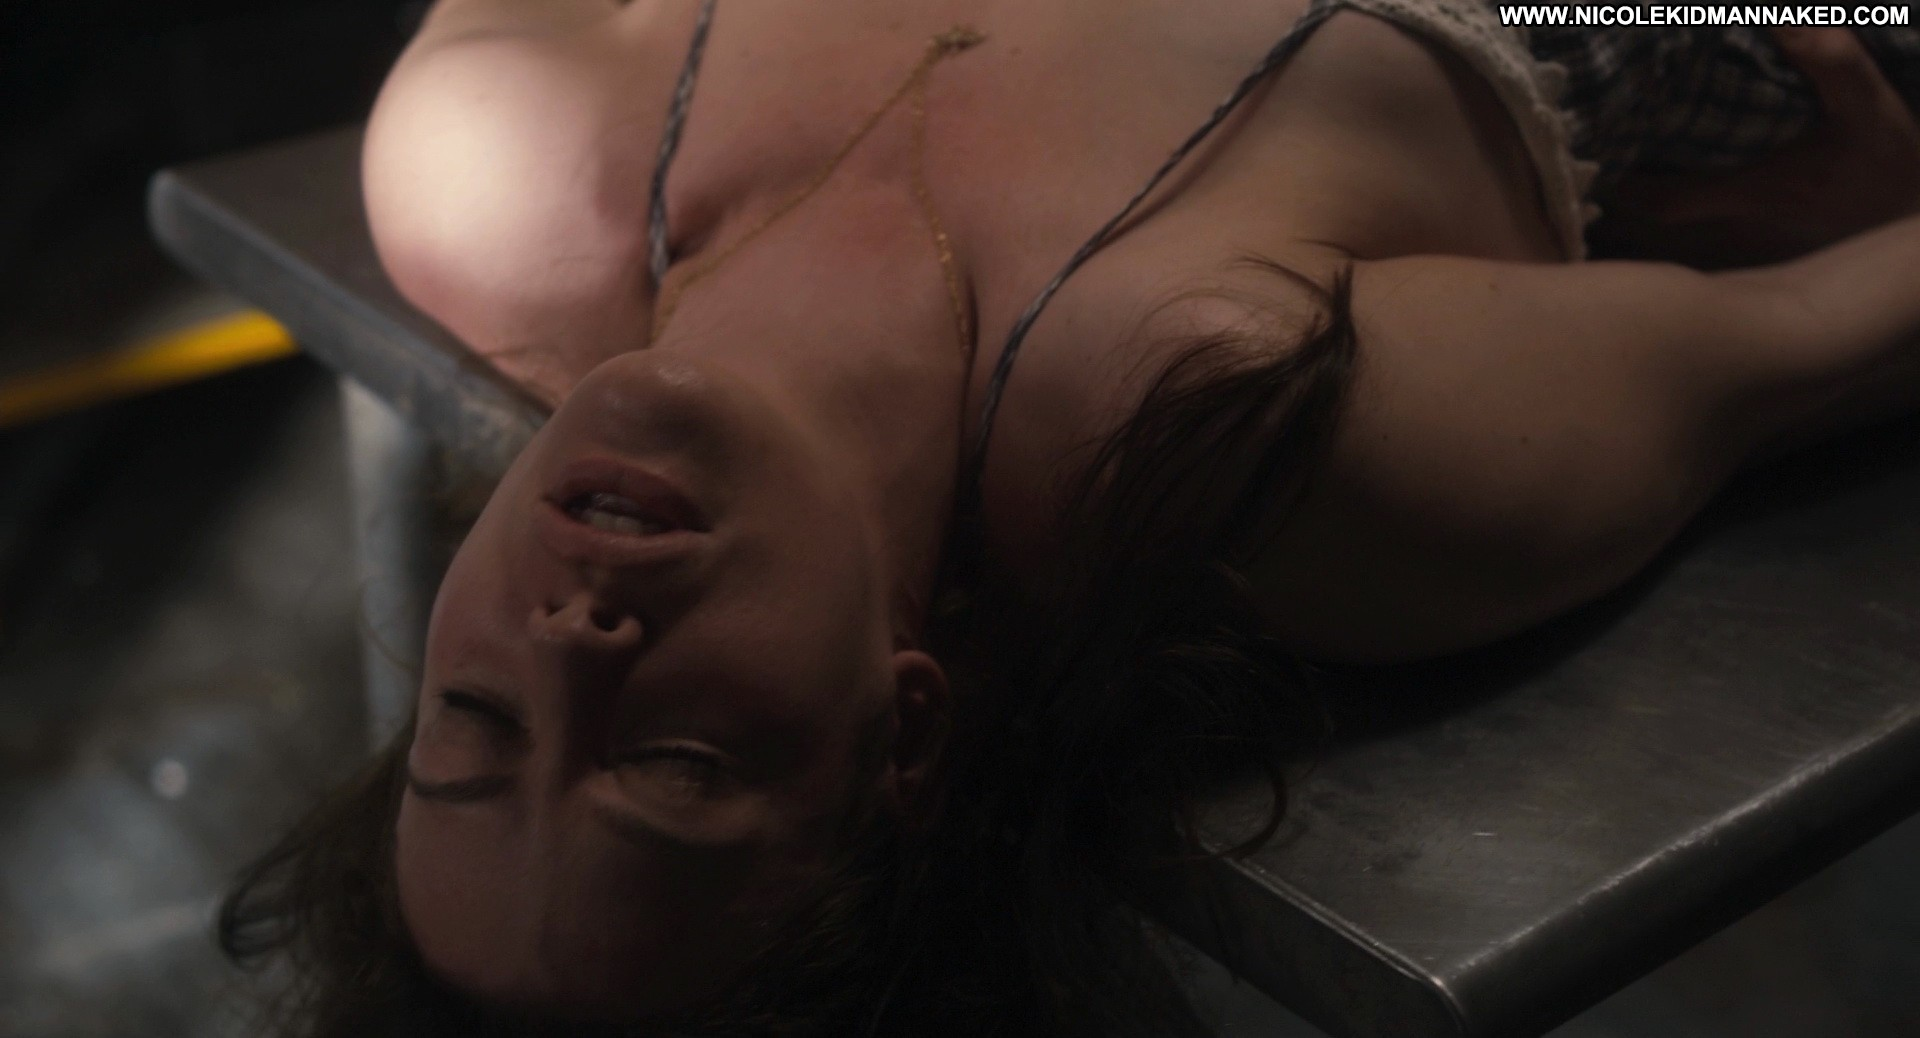 Naked liv tyler in armageddon ancensored